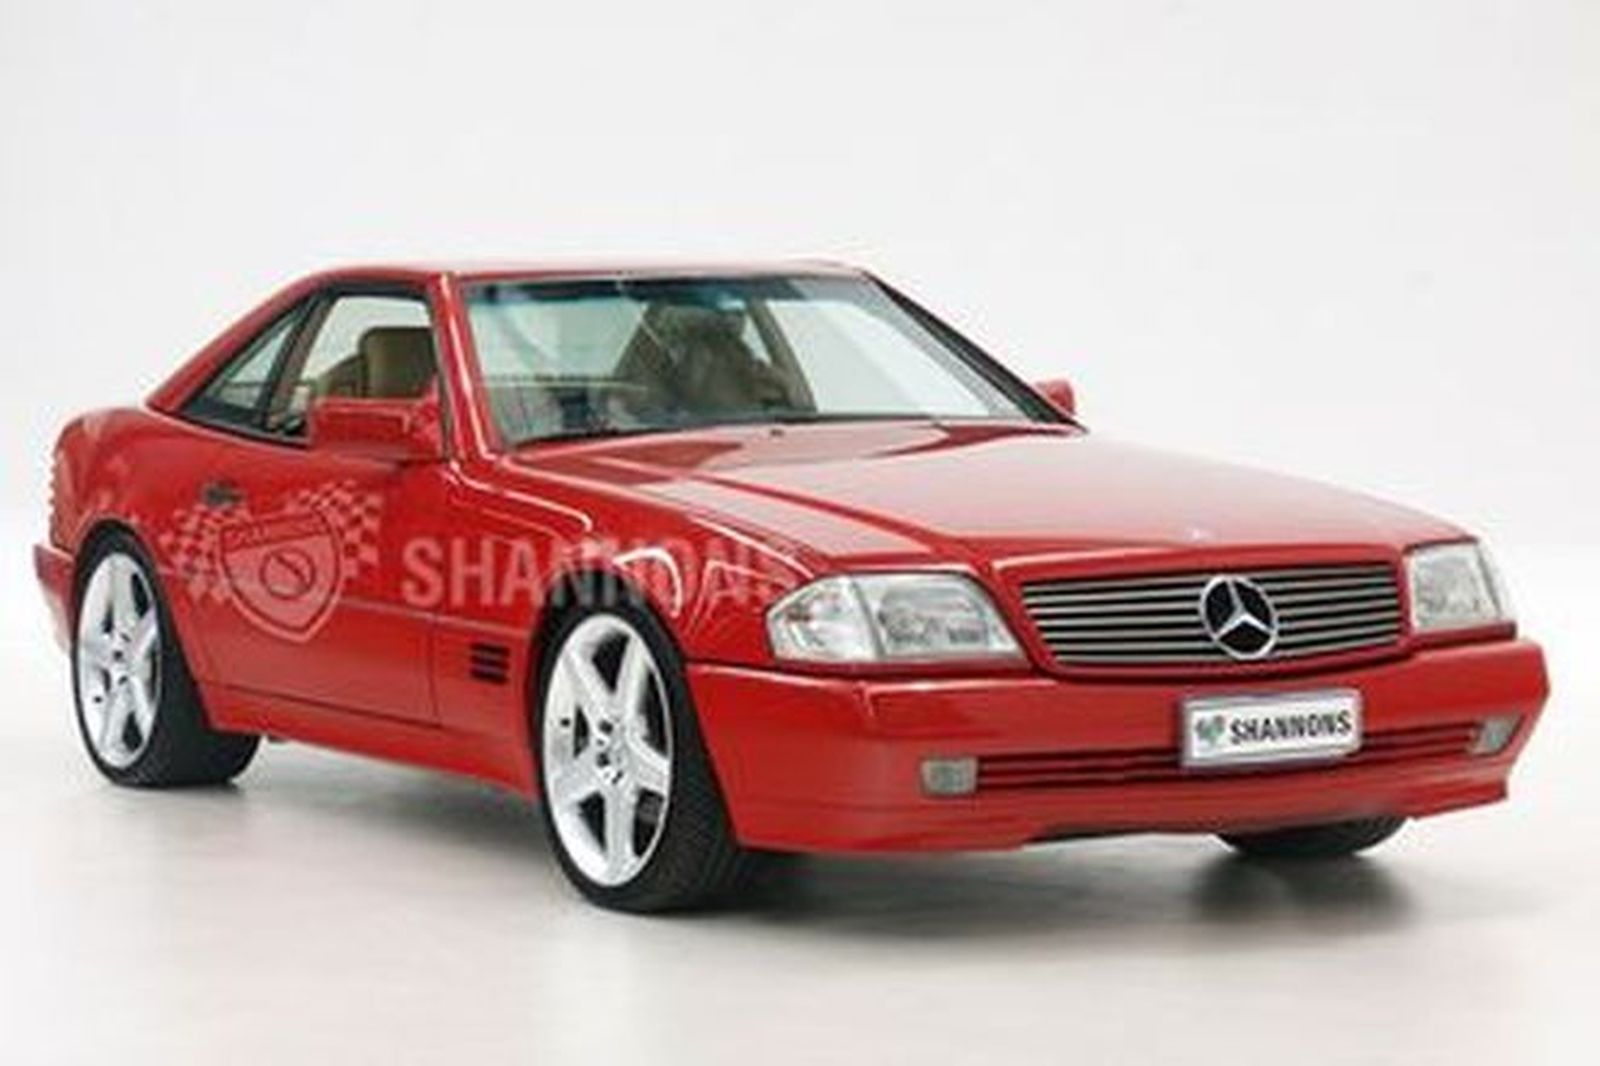 Mercedes-Benz SL500 R129 Convertible